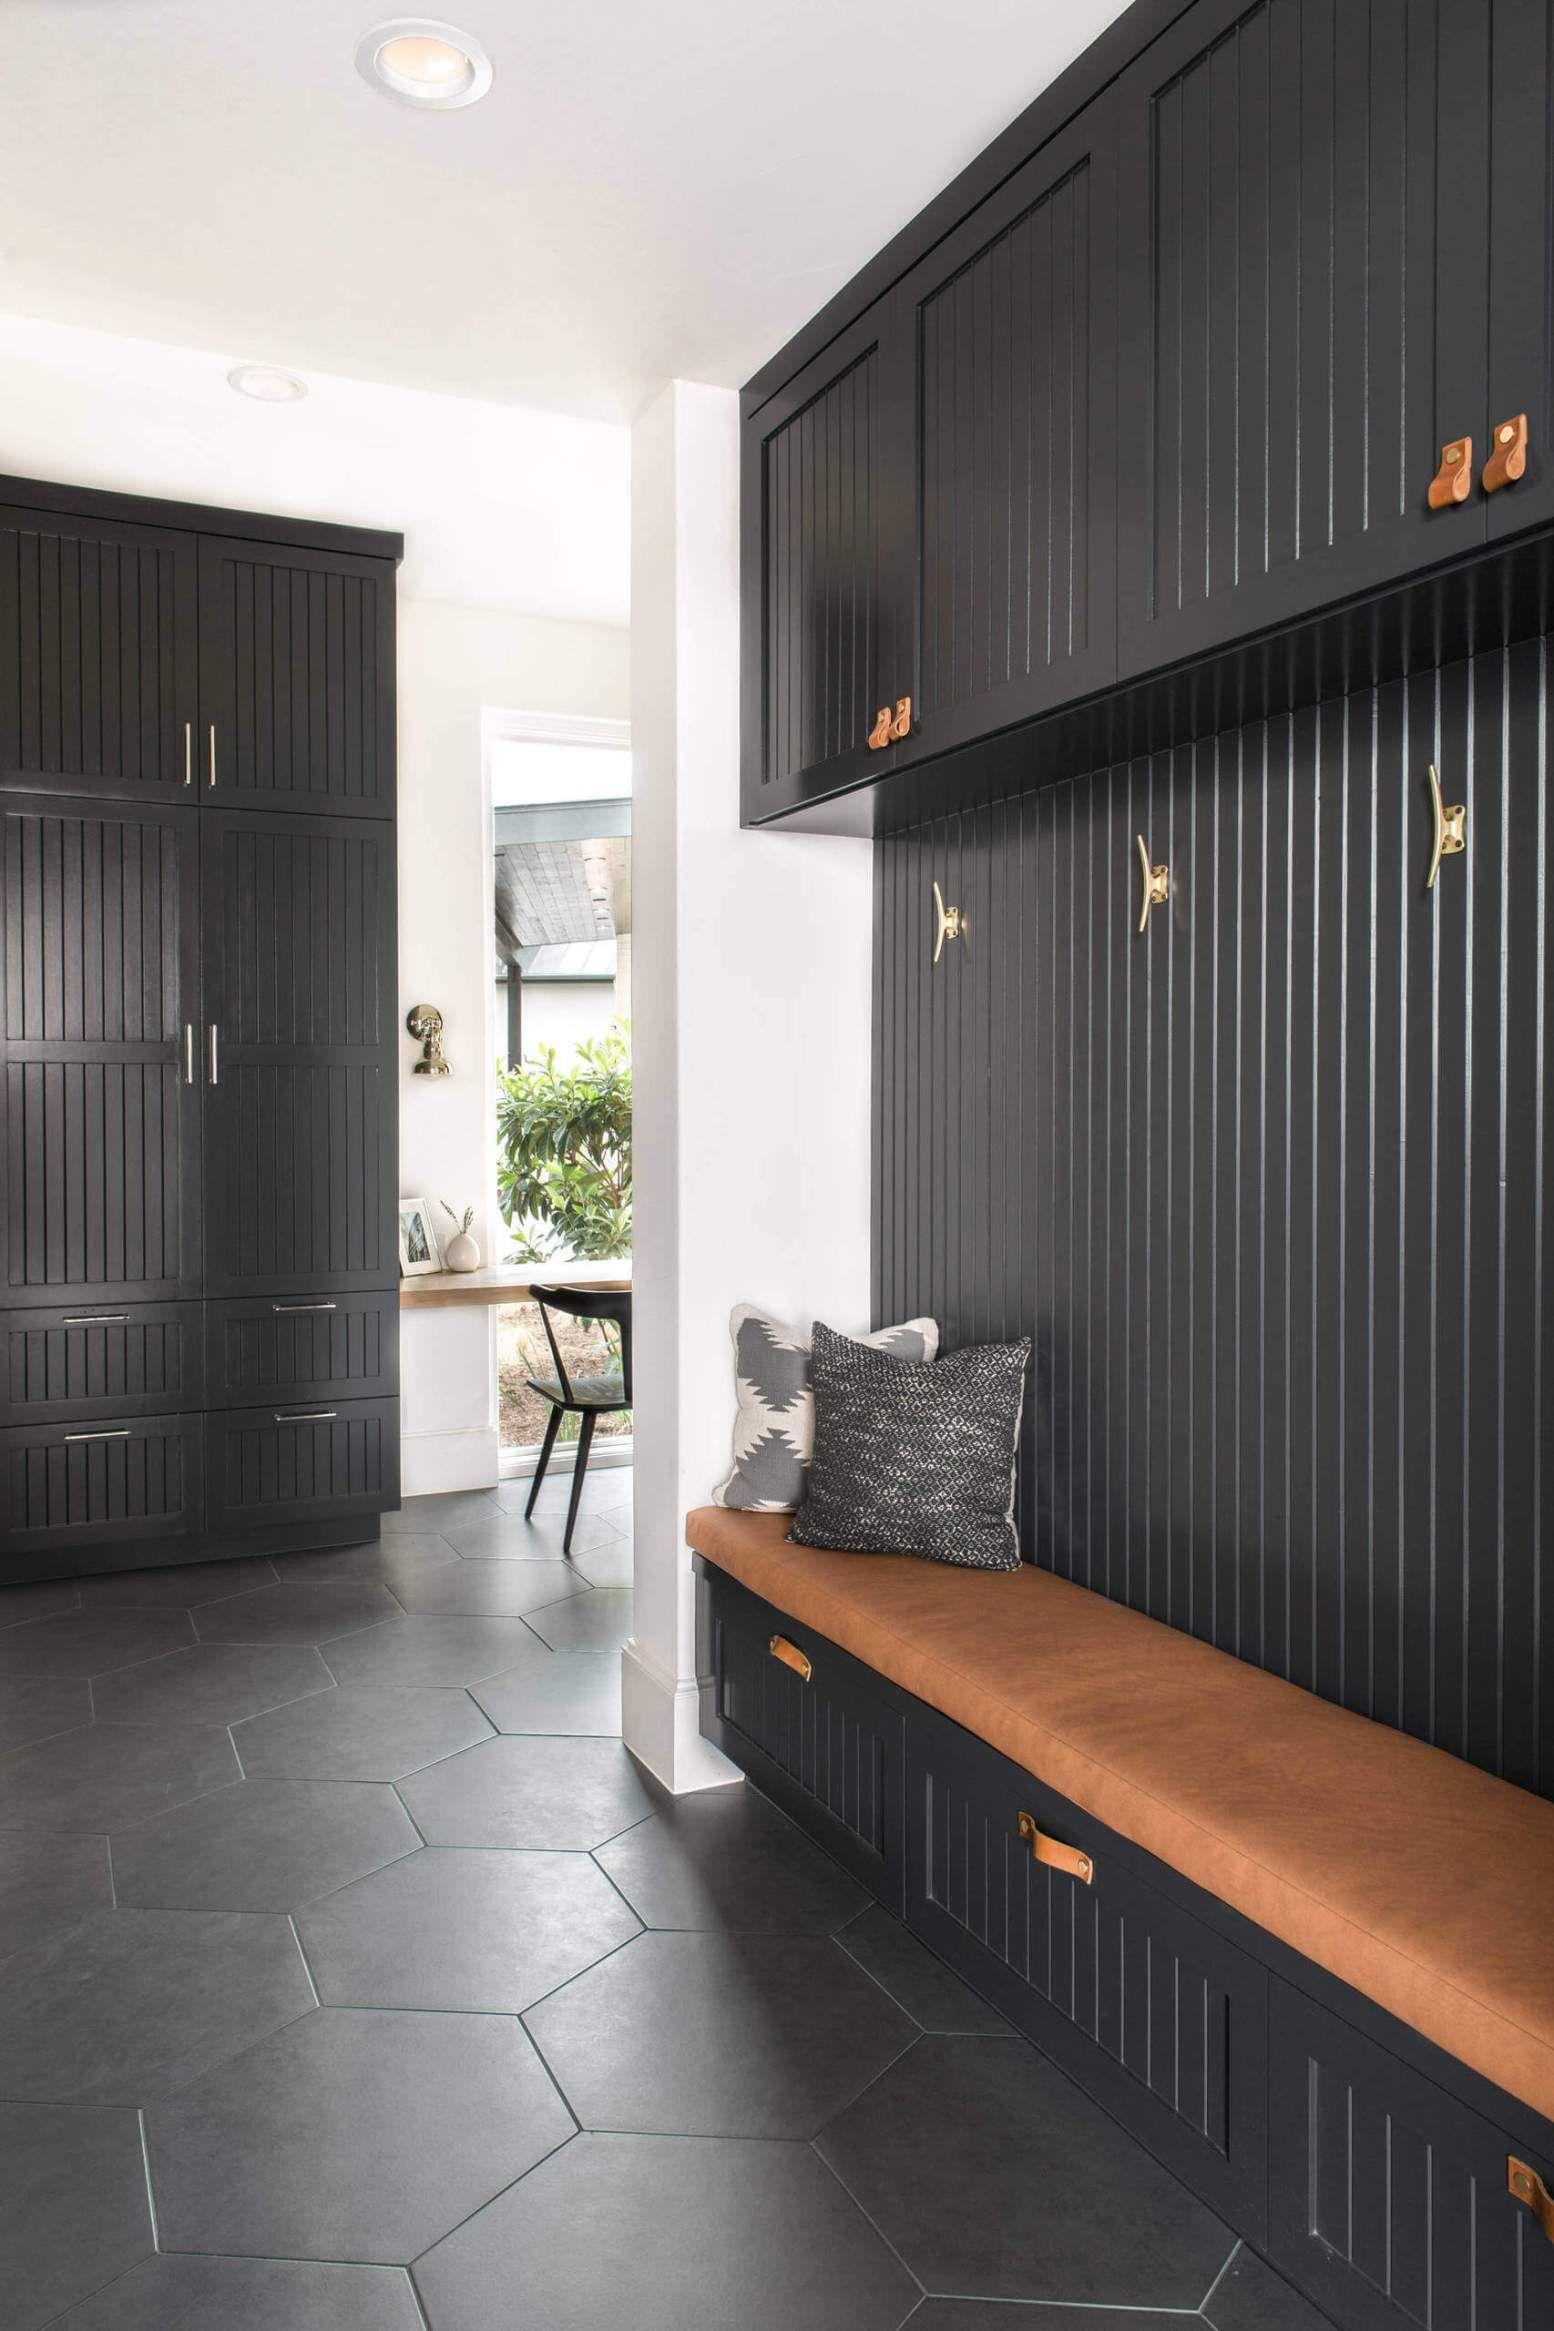 black entrance, black hexagonal floor tiles, black wooden cabinet, long brown cushion